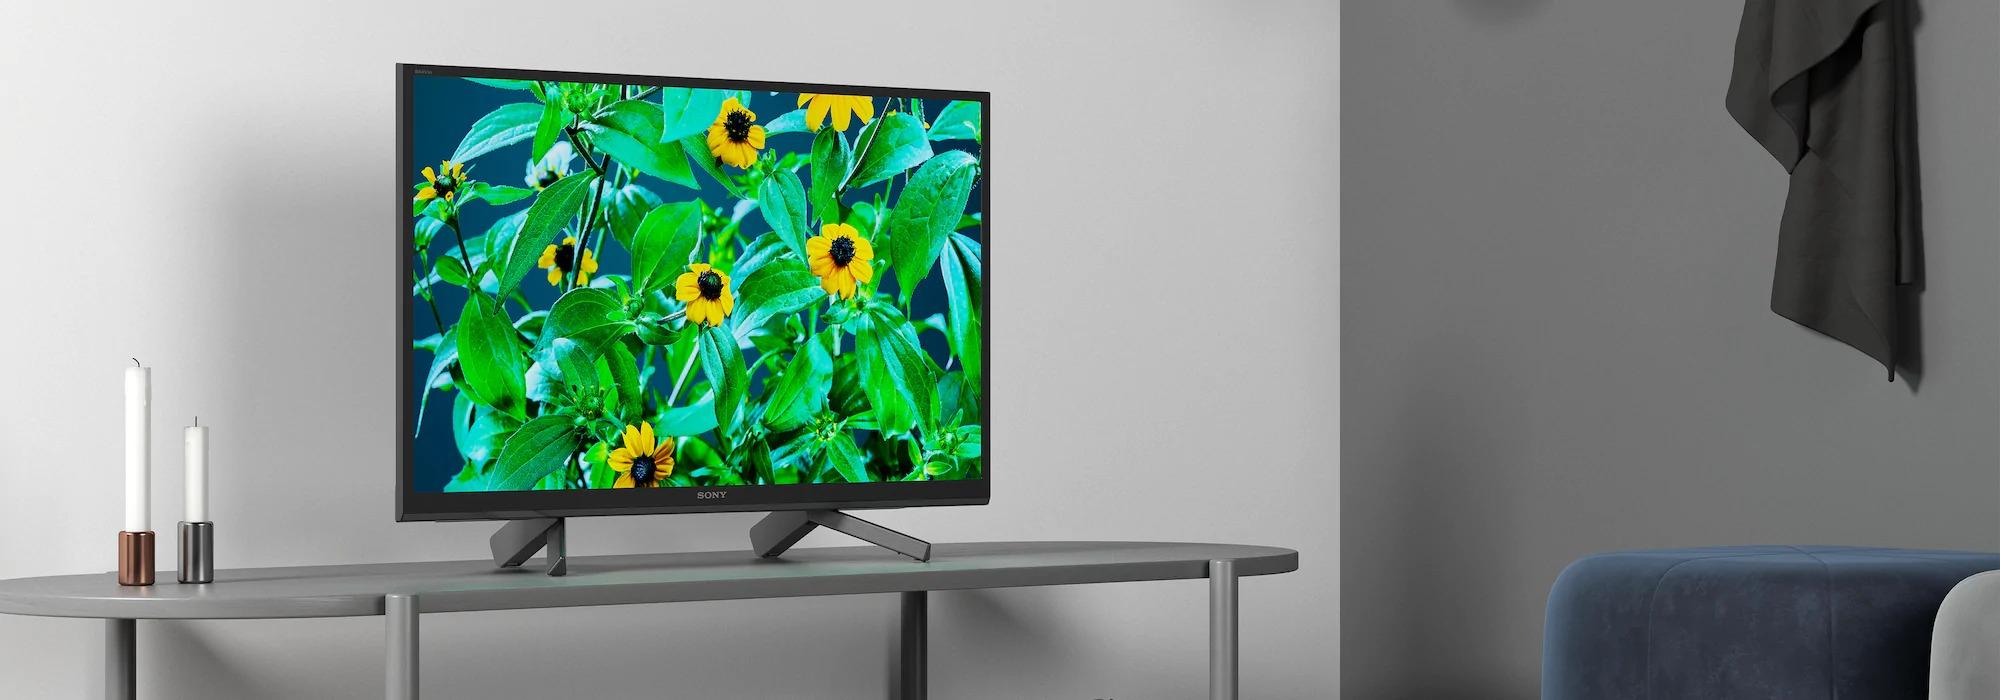 Tivi Sony KDL-32W610G Smart TV với internet - Youtube